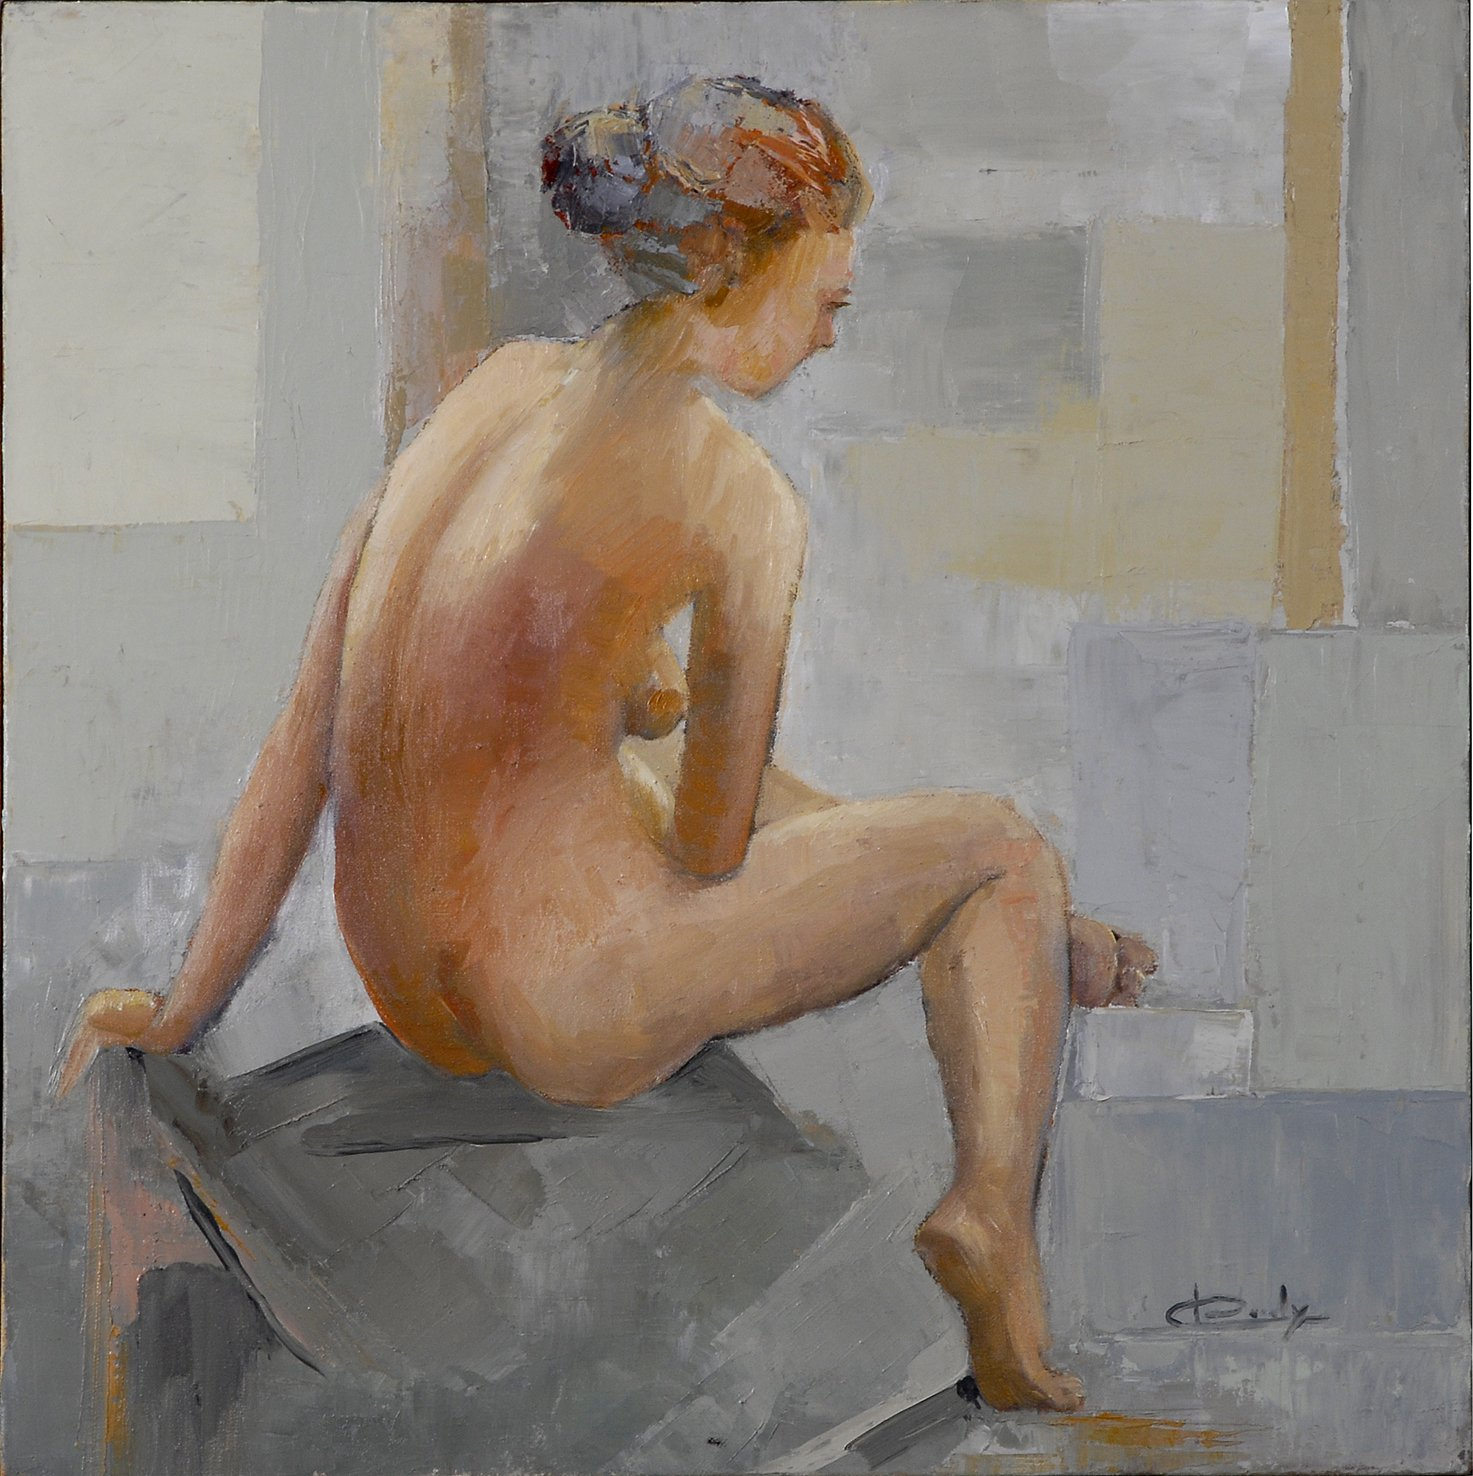 nu de l'artiste peintre Sylvie Caroly